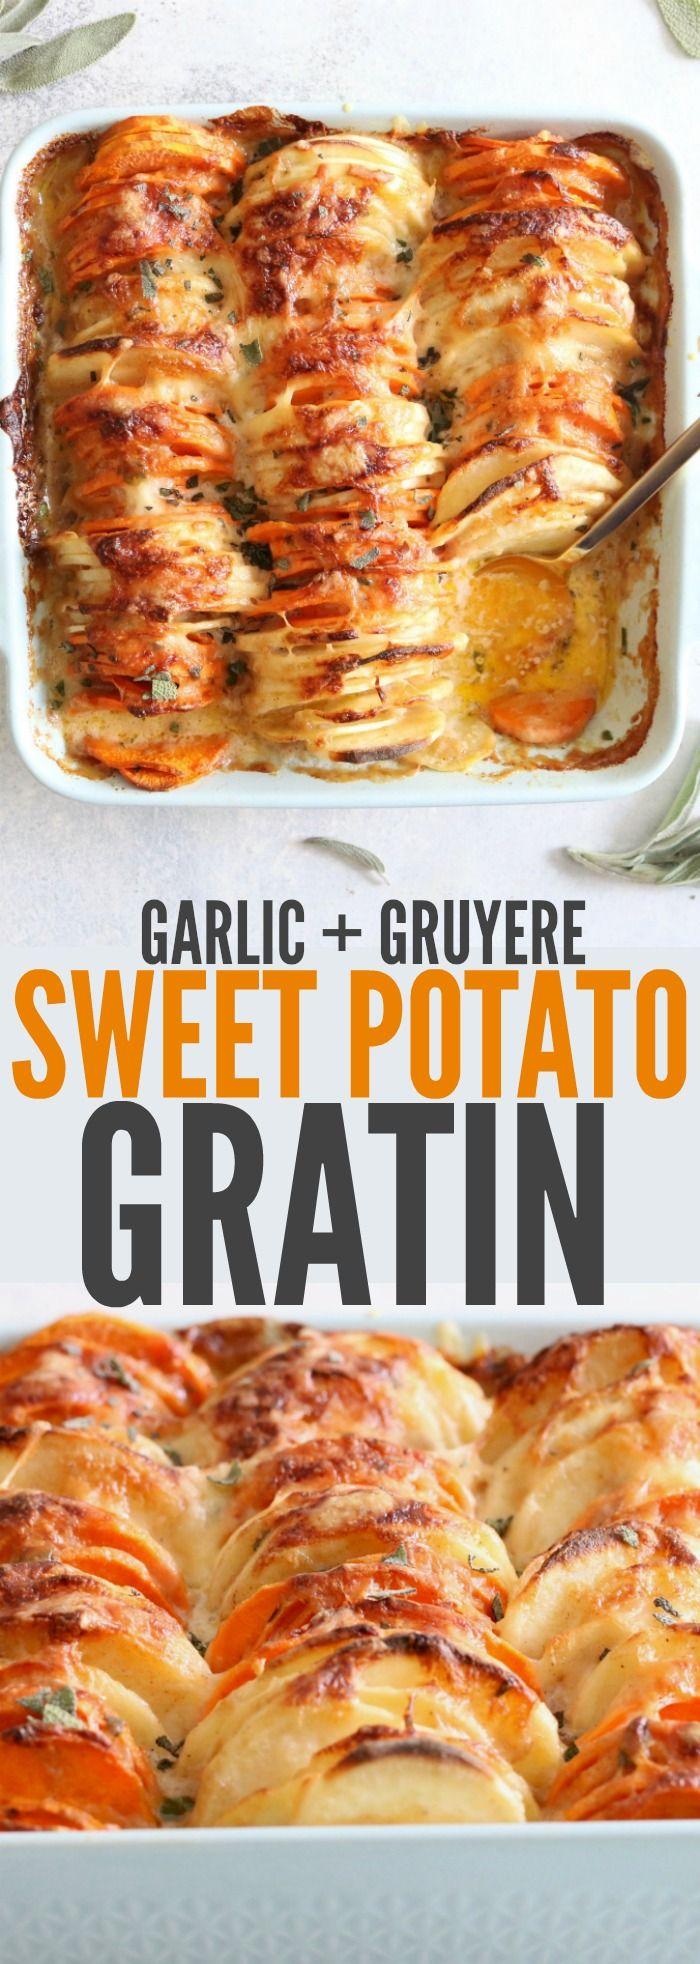 Garlic & Gruyere Sweet Potato Gratin / makes 6 servings / 1 serving = 373 cal, 25.9g F, 10.4g P / 26g C / sweet potatoes, butter, garlic, sage, heavy cream, arrowroot powder, gruyere cheese, smoked gouda cheese